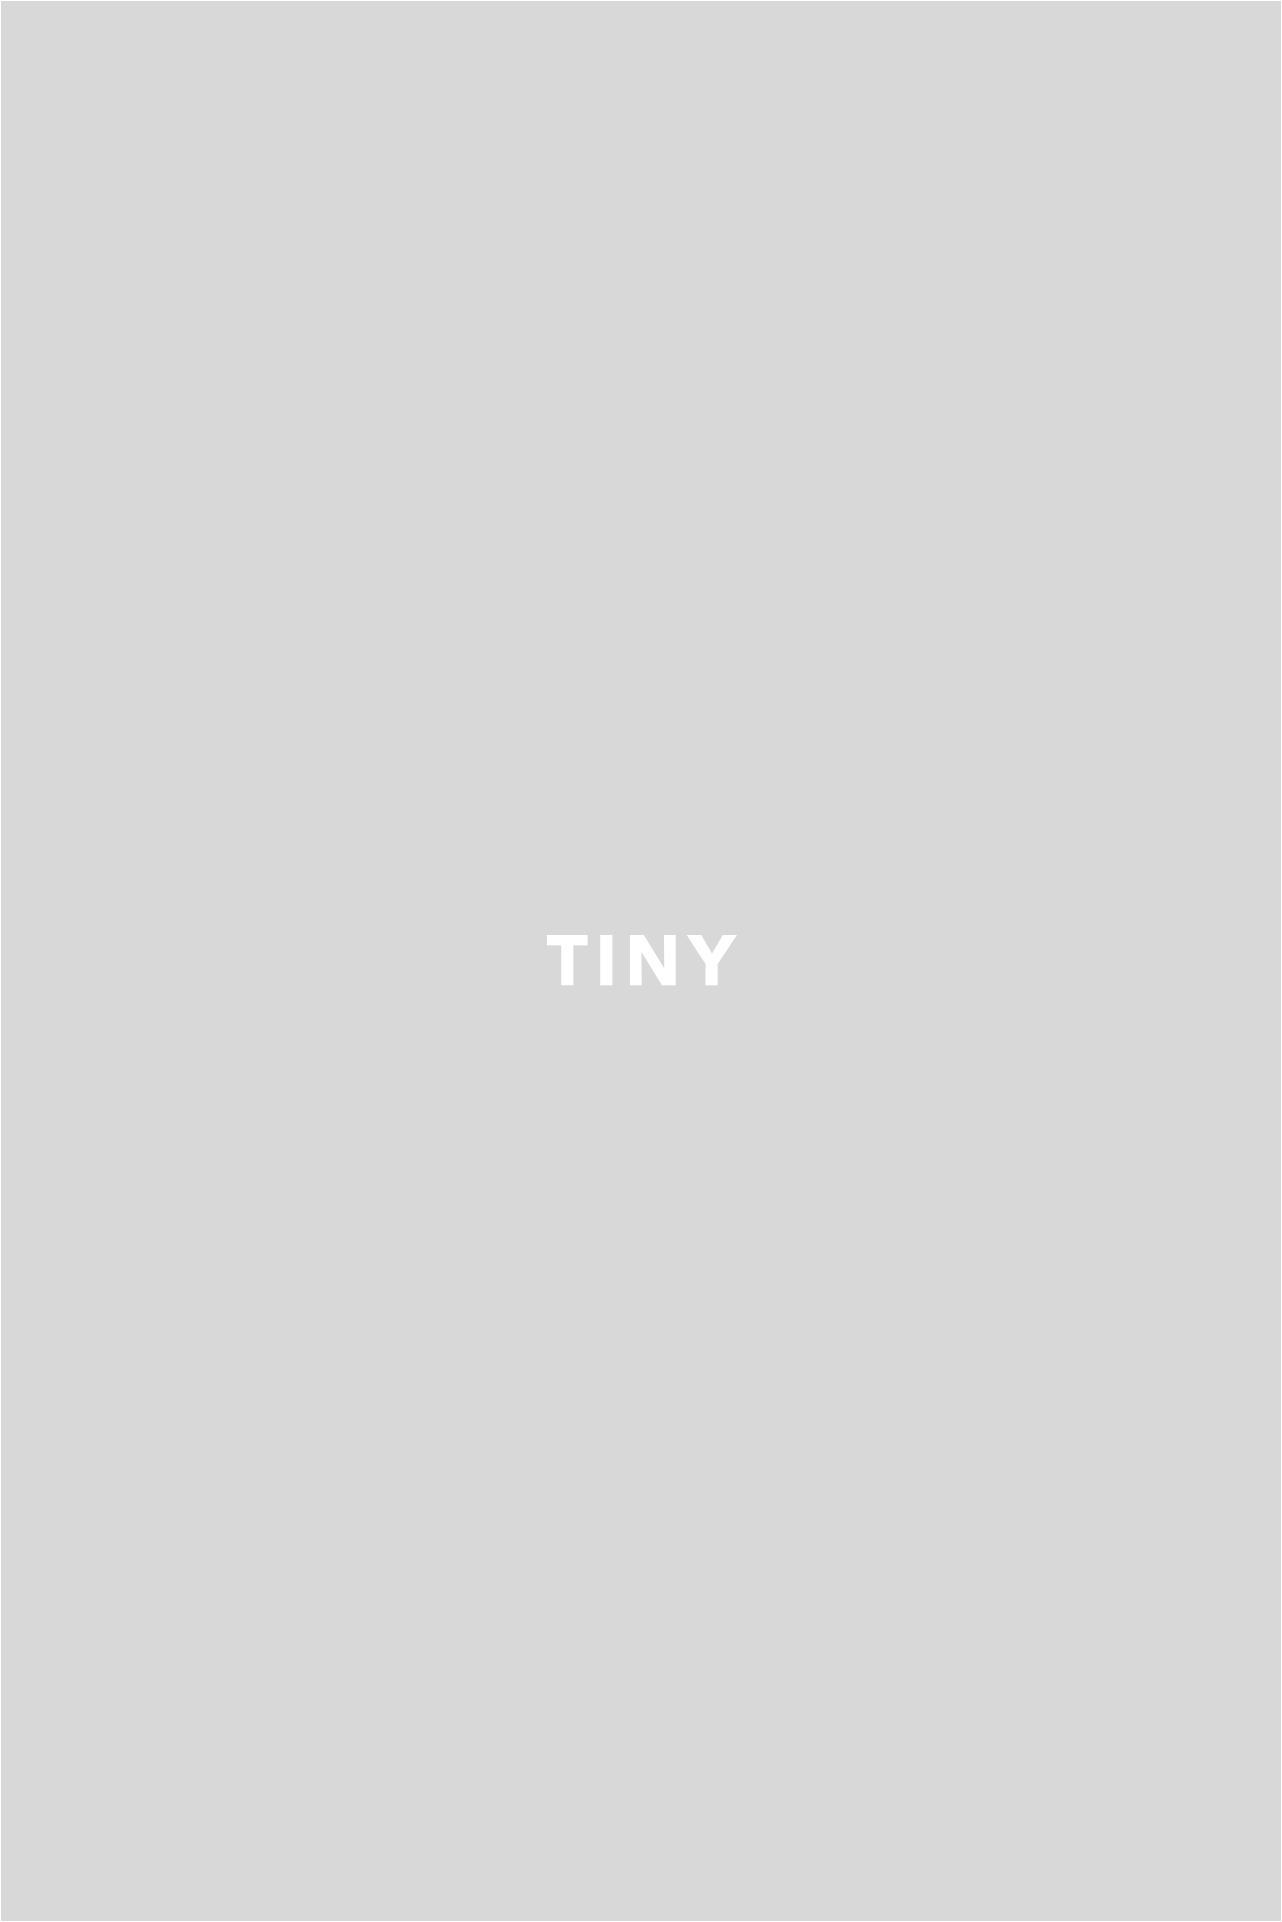 DOLCE FAR NIENTE notebook